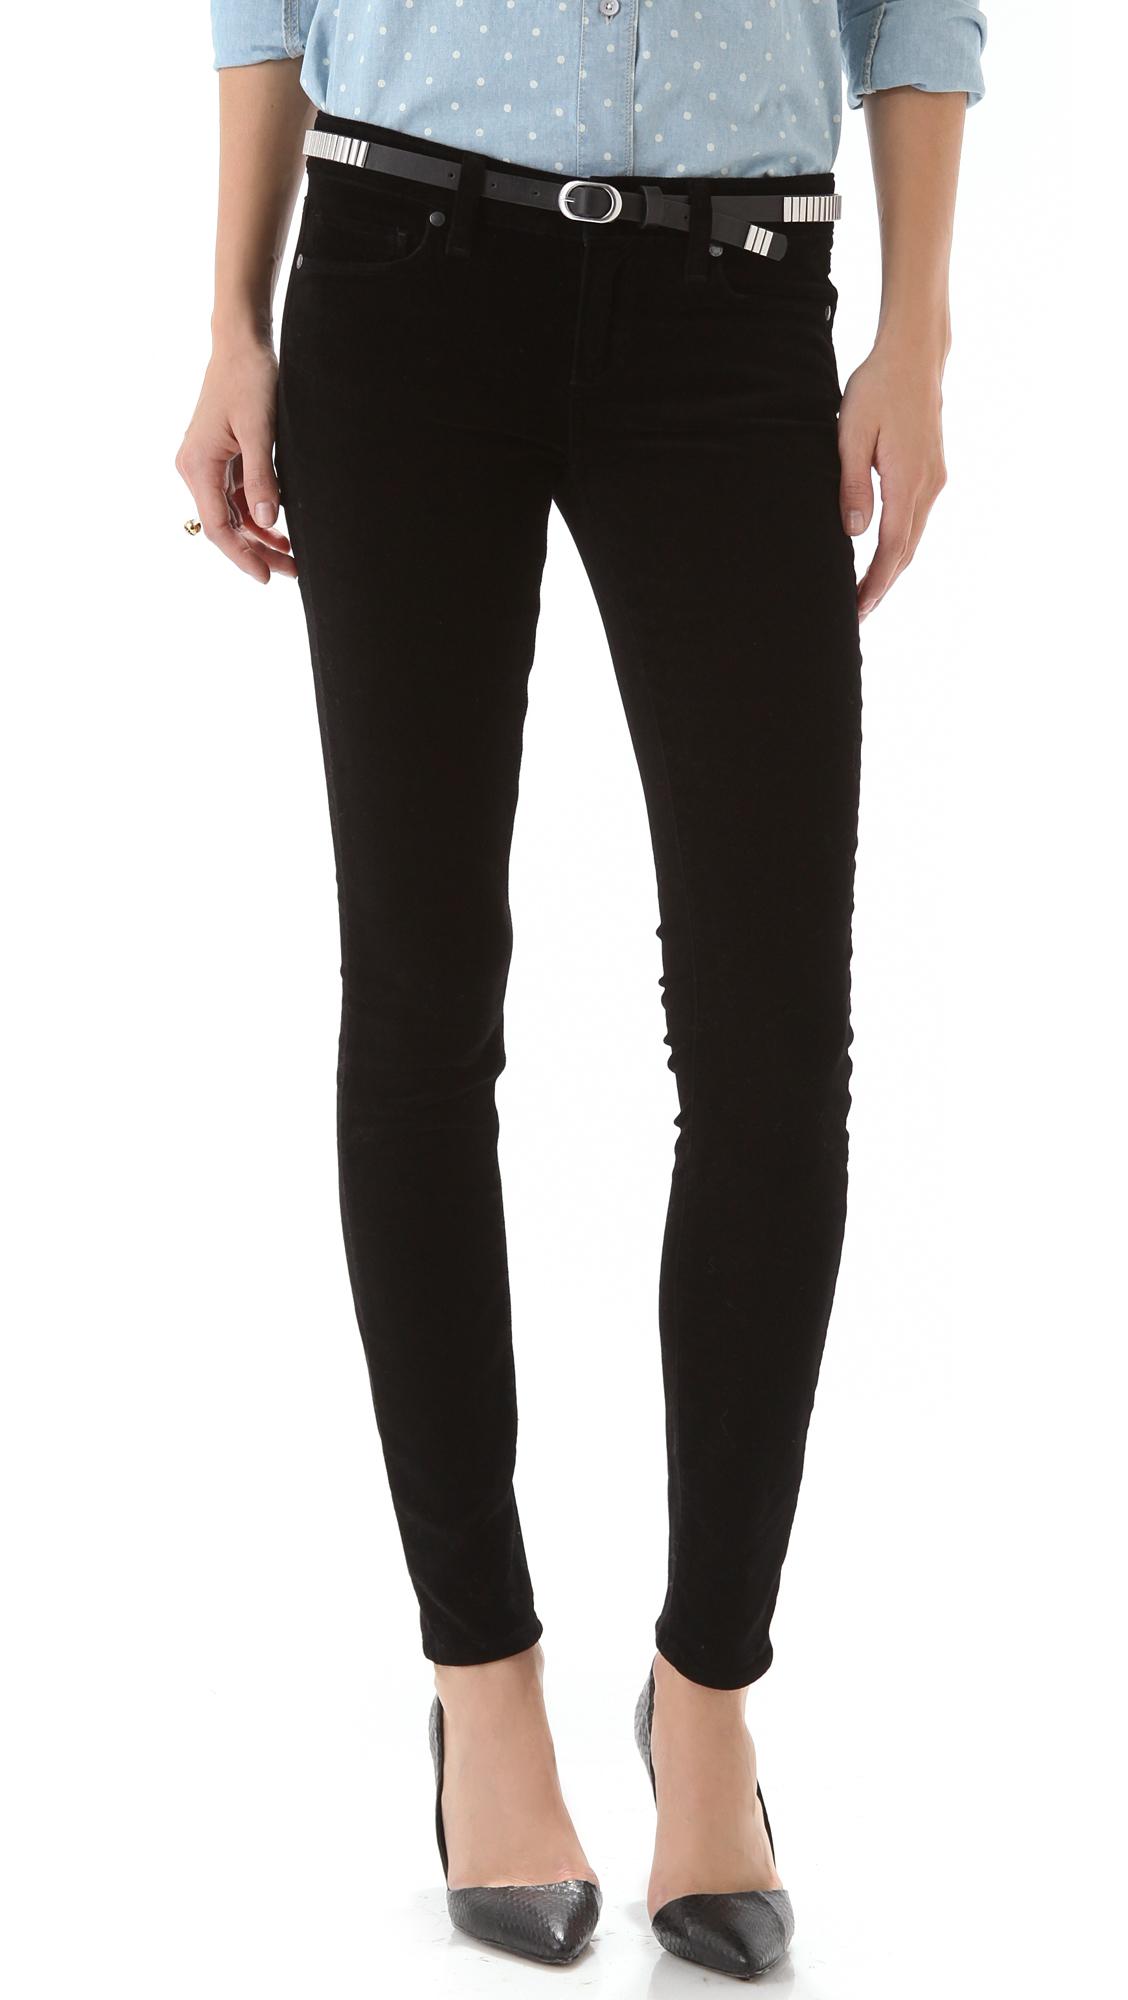 New Paige Premium Denim VERDUGO ULTRA SKINNY black velvet ...